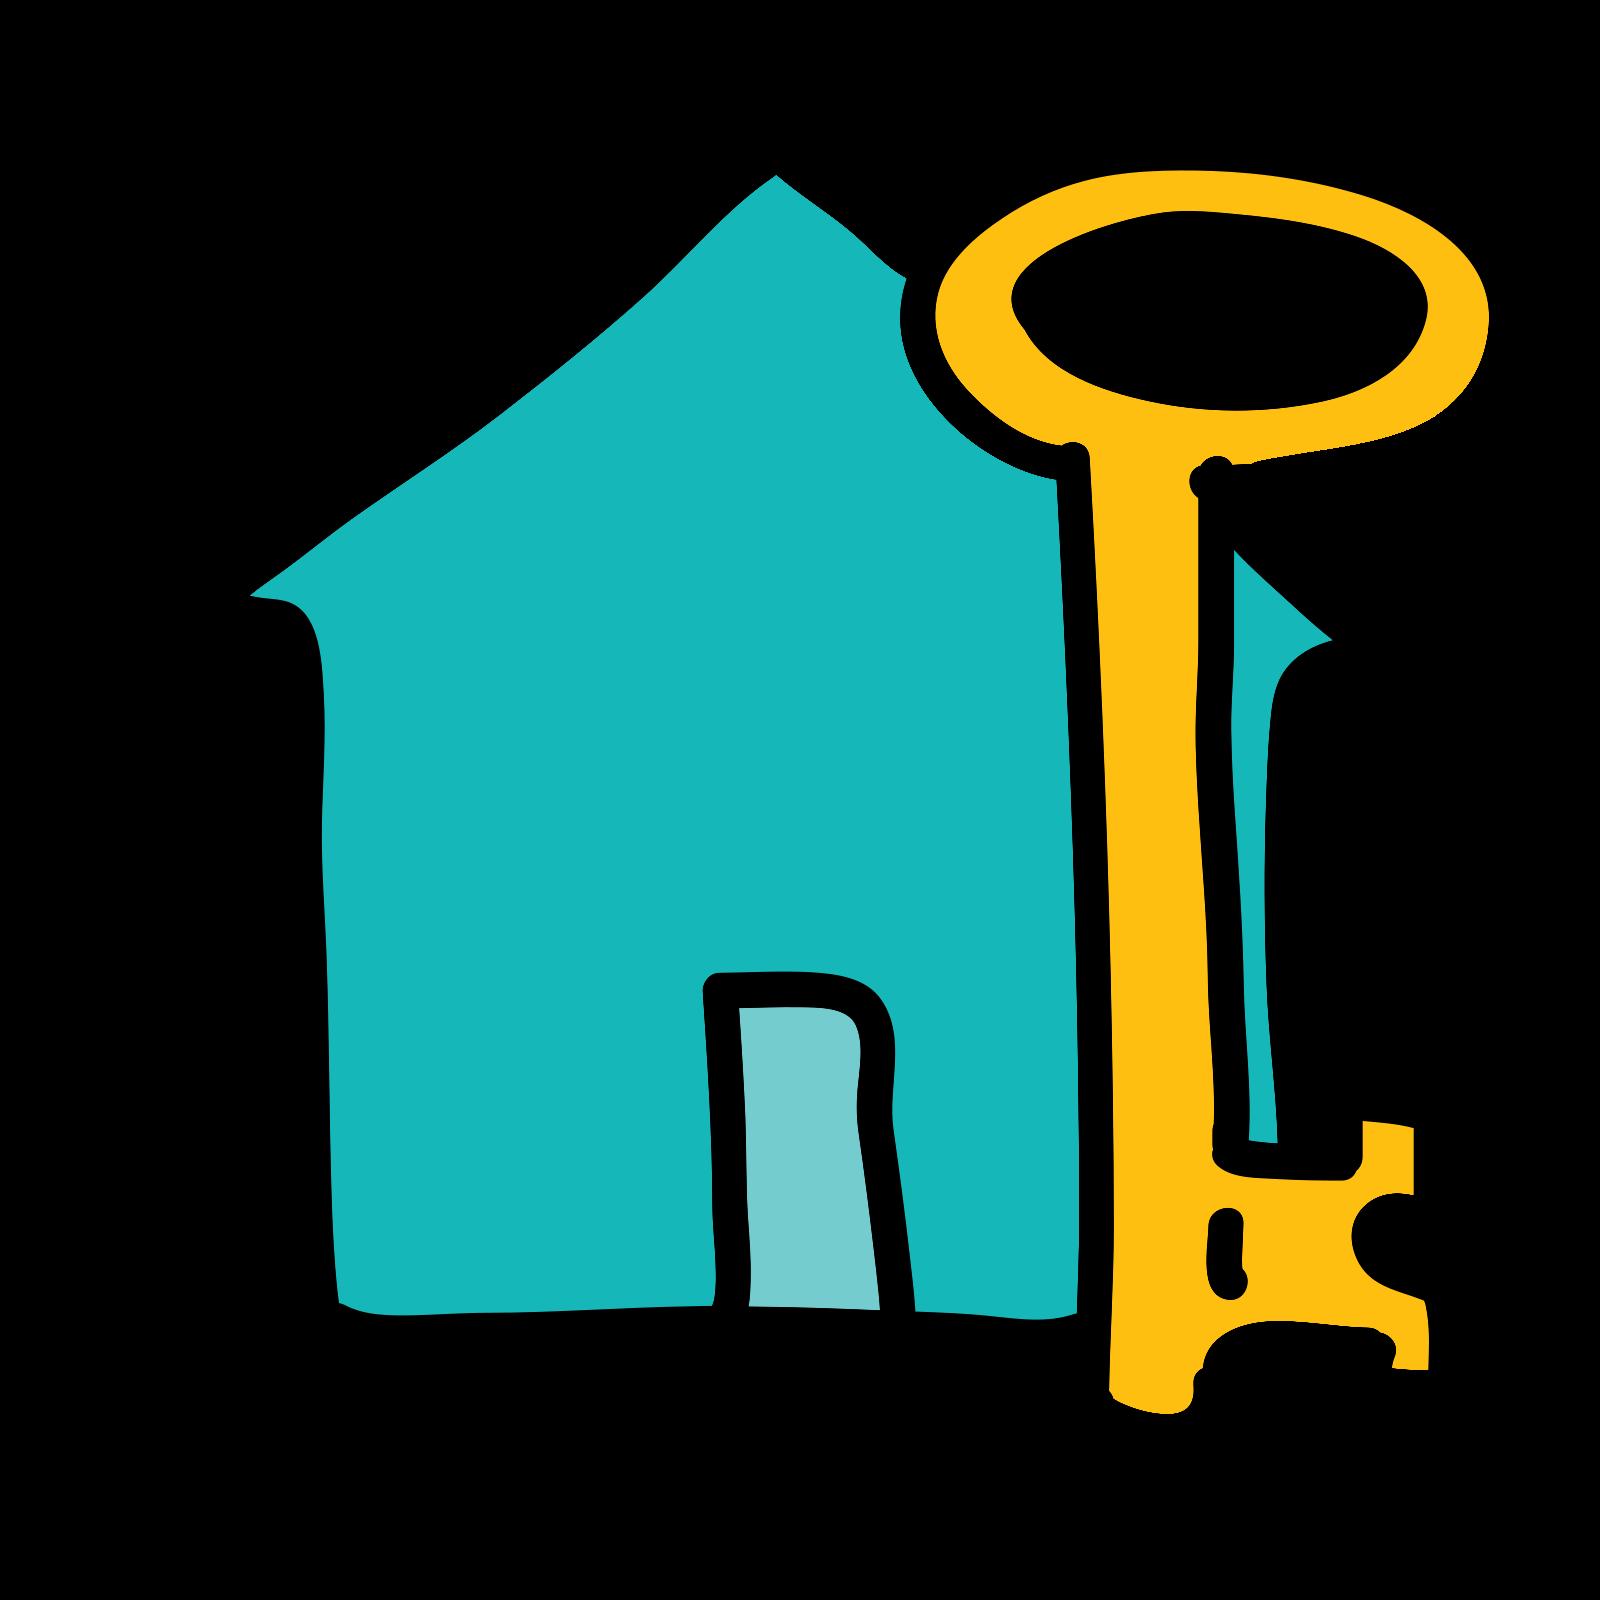 House Keys icon